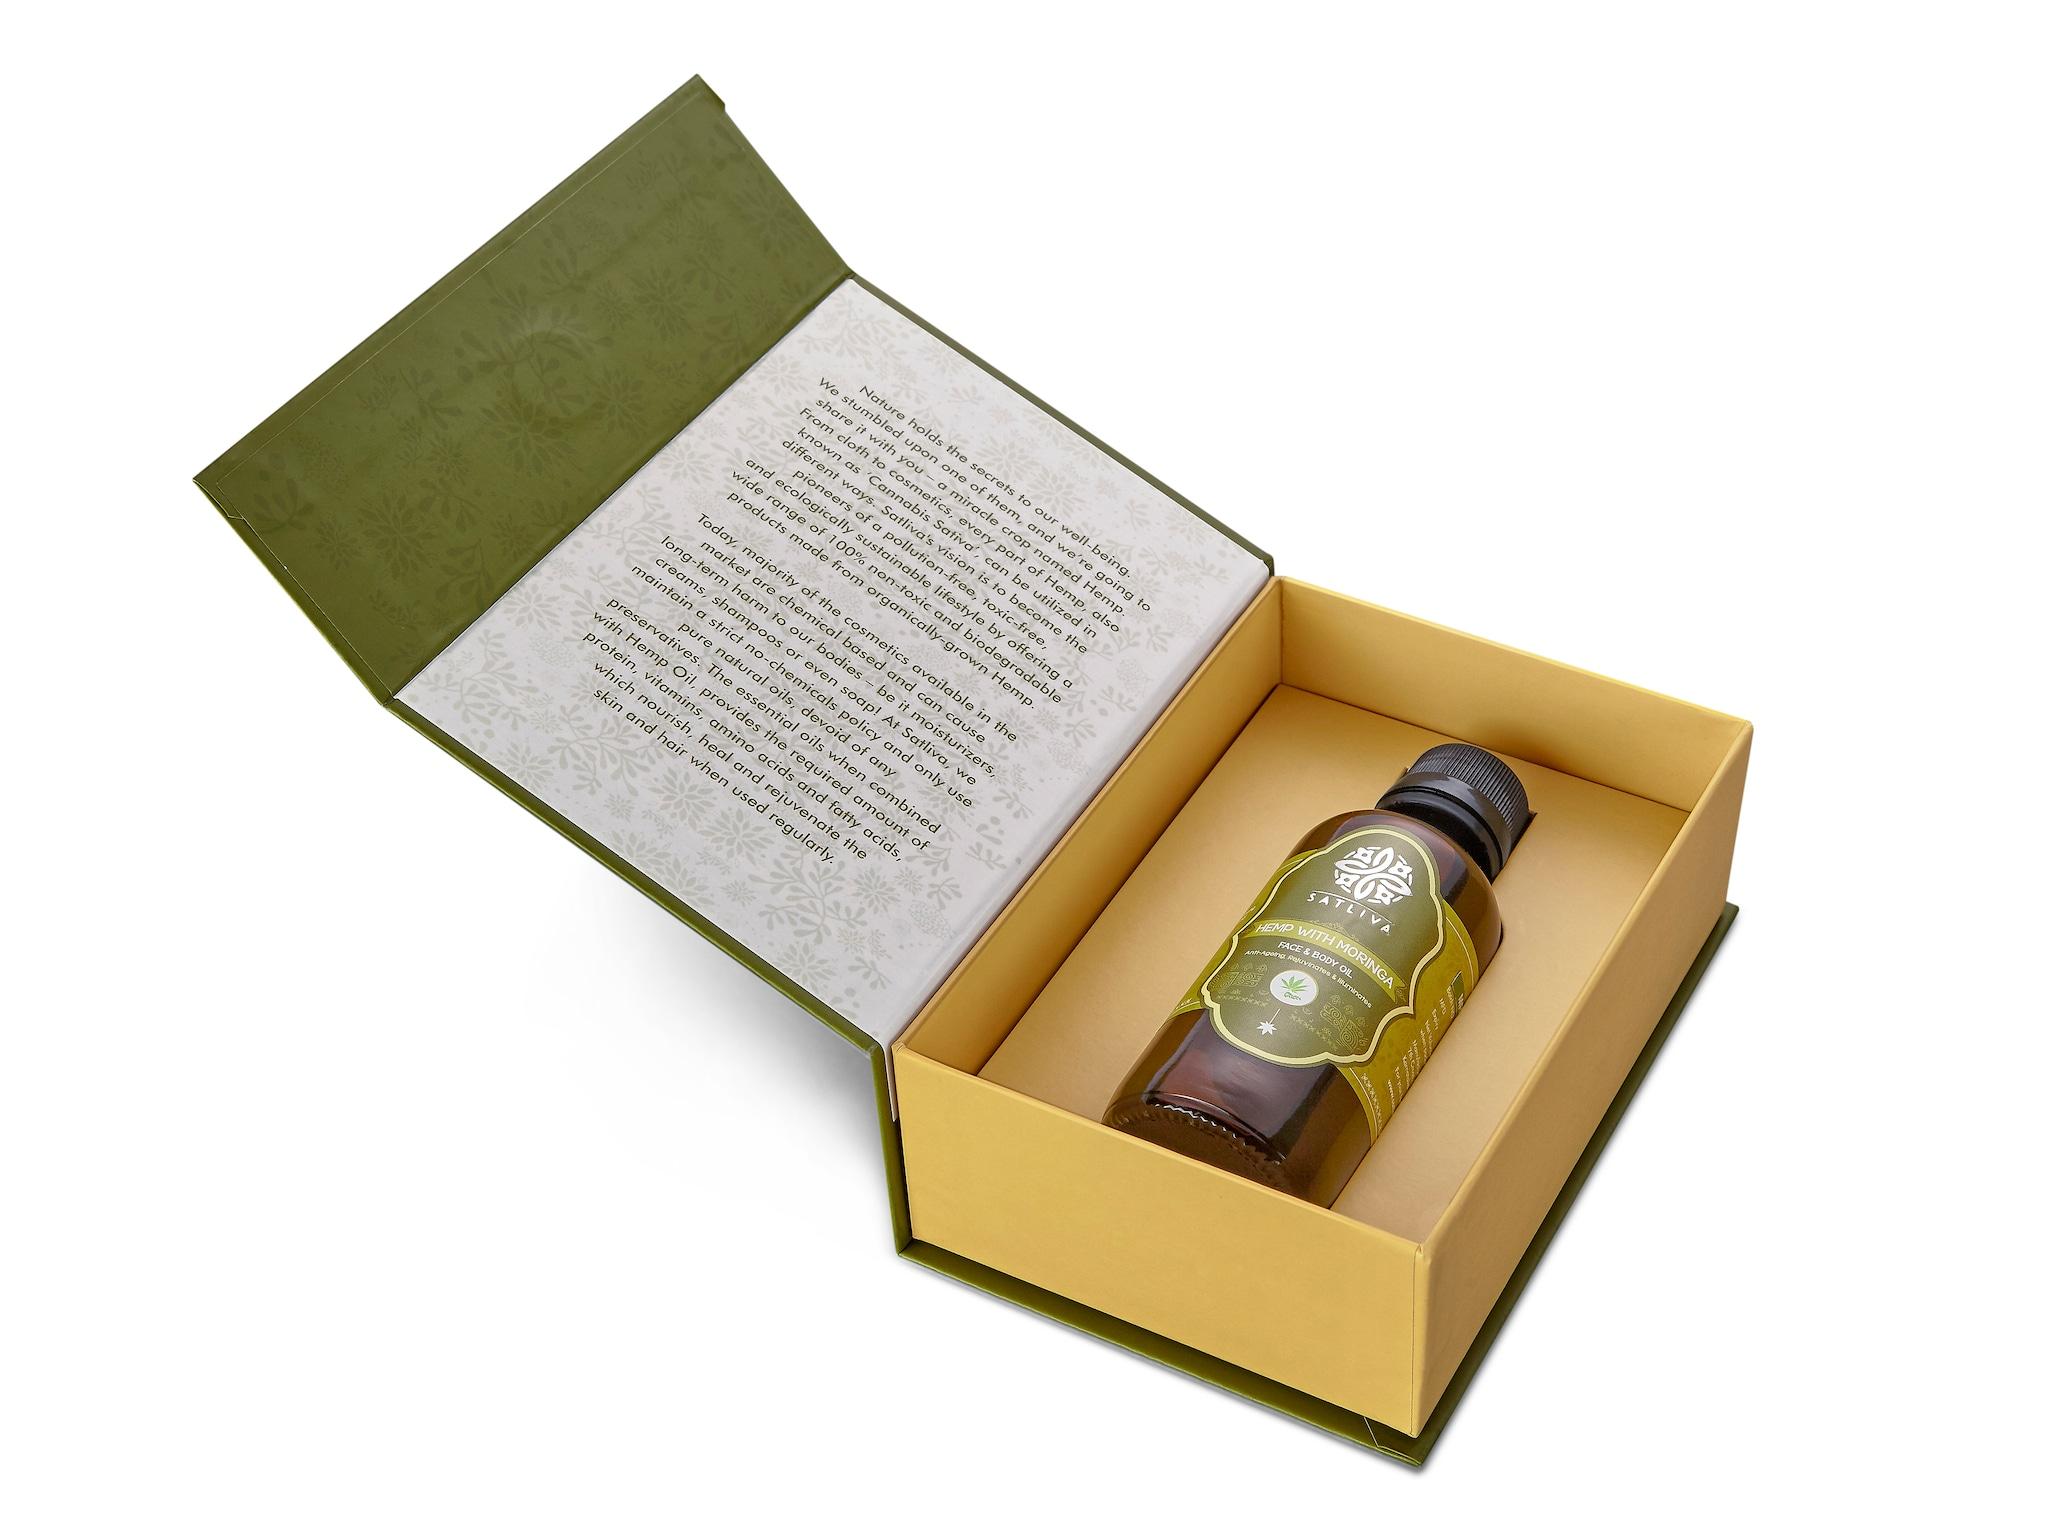 Satliva Hemp With Moringa Body And Face Oil (100ml)